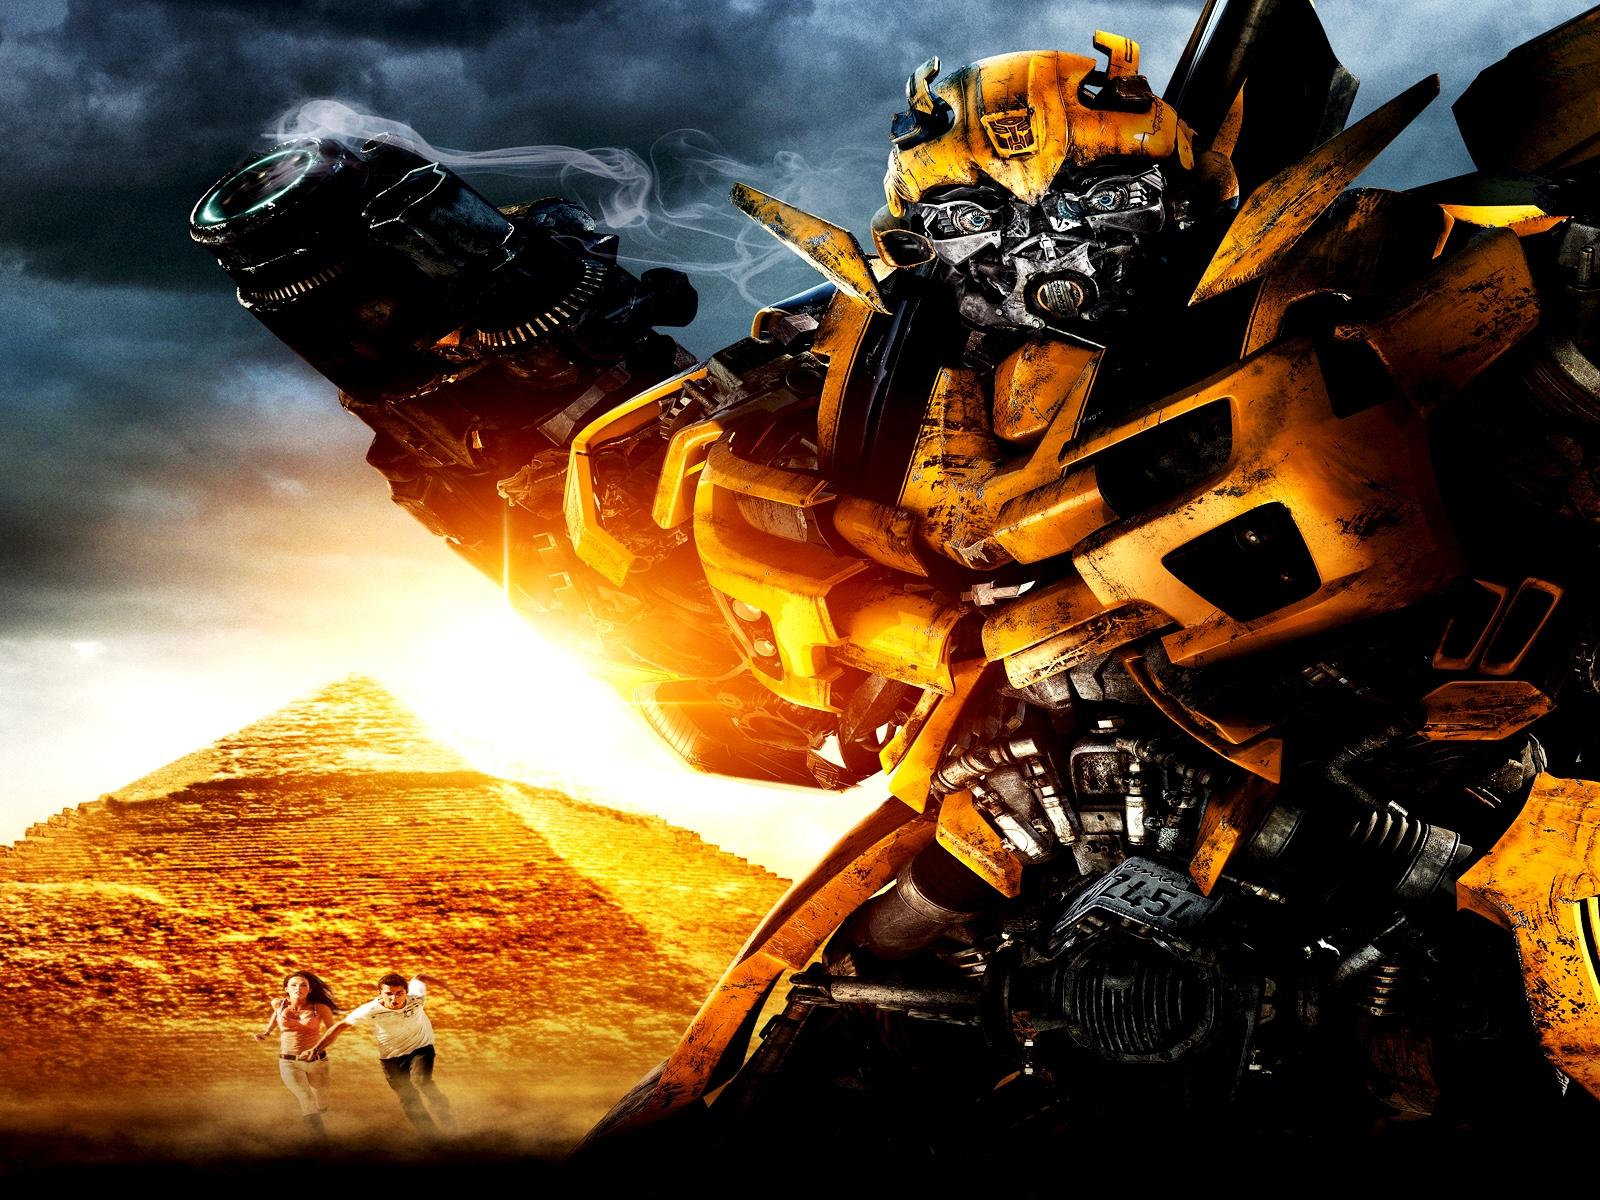 bumblebee transformers wallpaper hd free